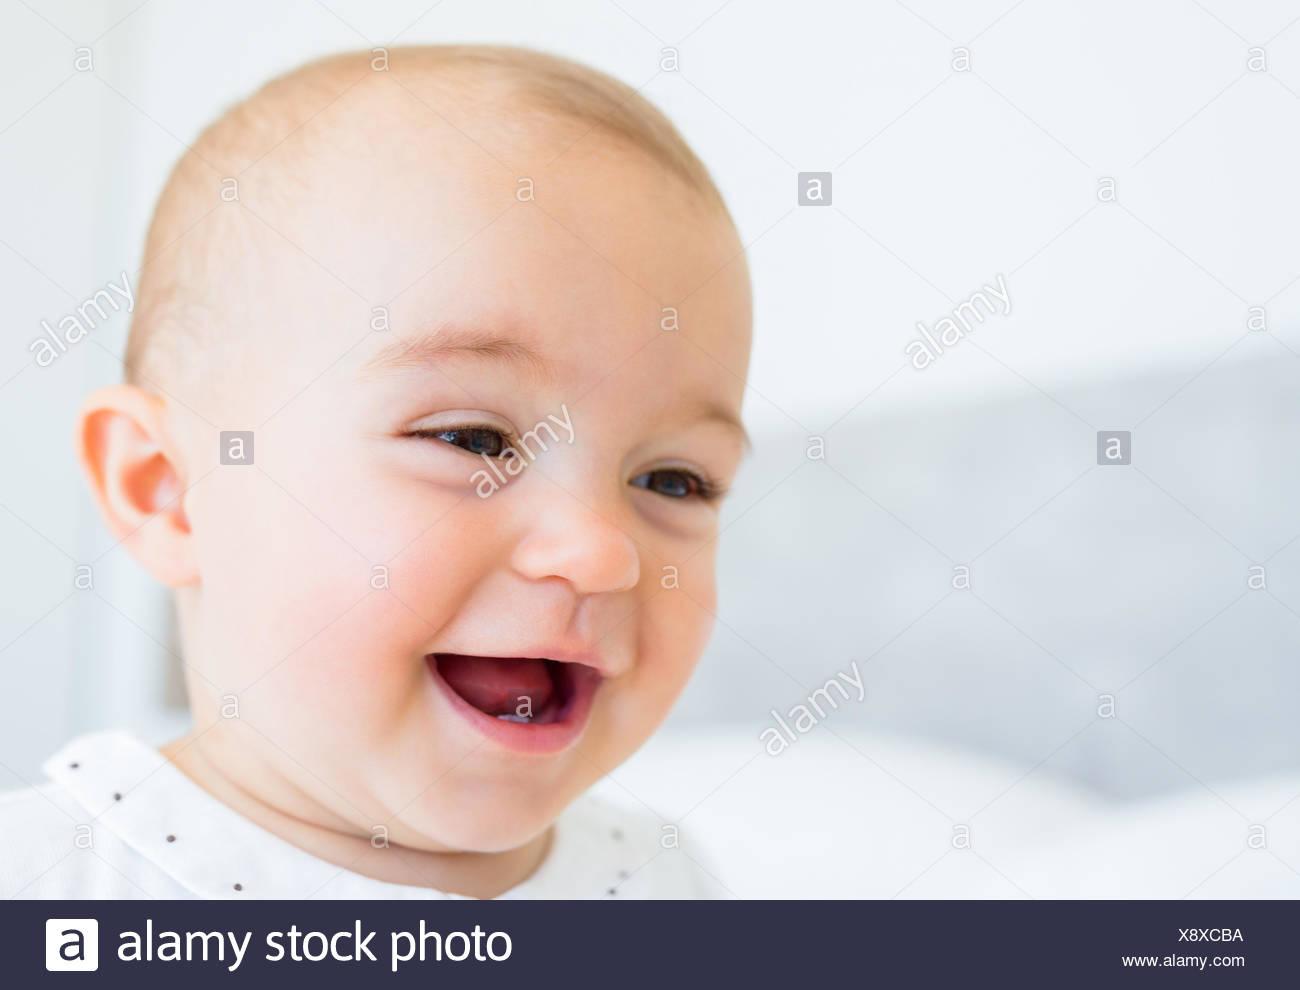 c3f8370e4 Closeup portrait of a smiling cute baby Stock Photo: 280863614 - Alamy